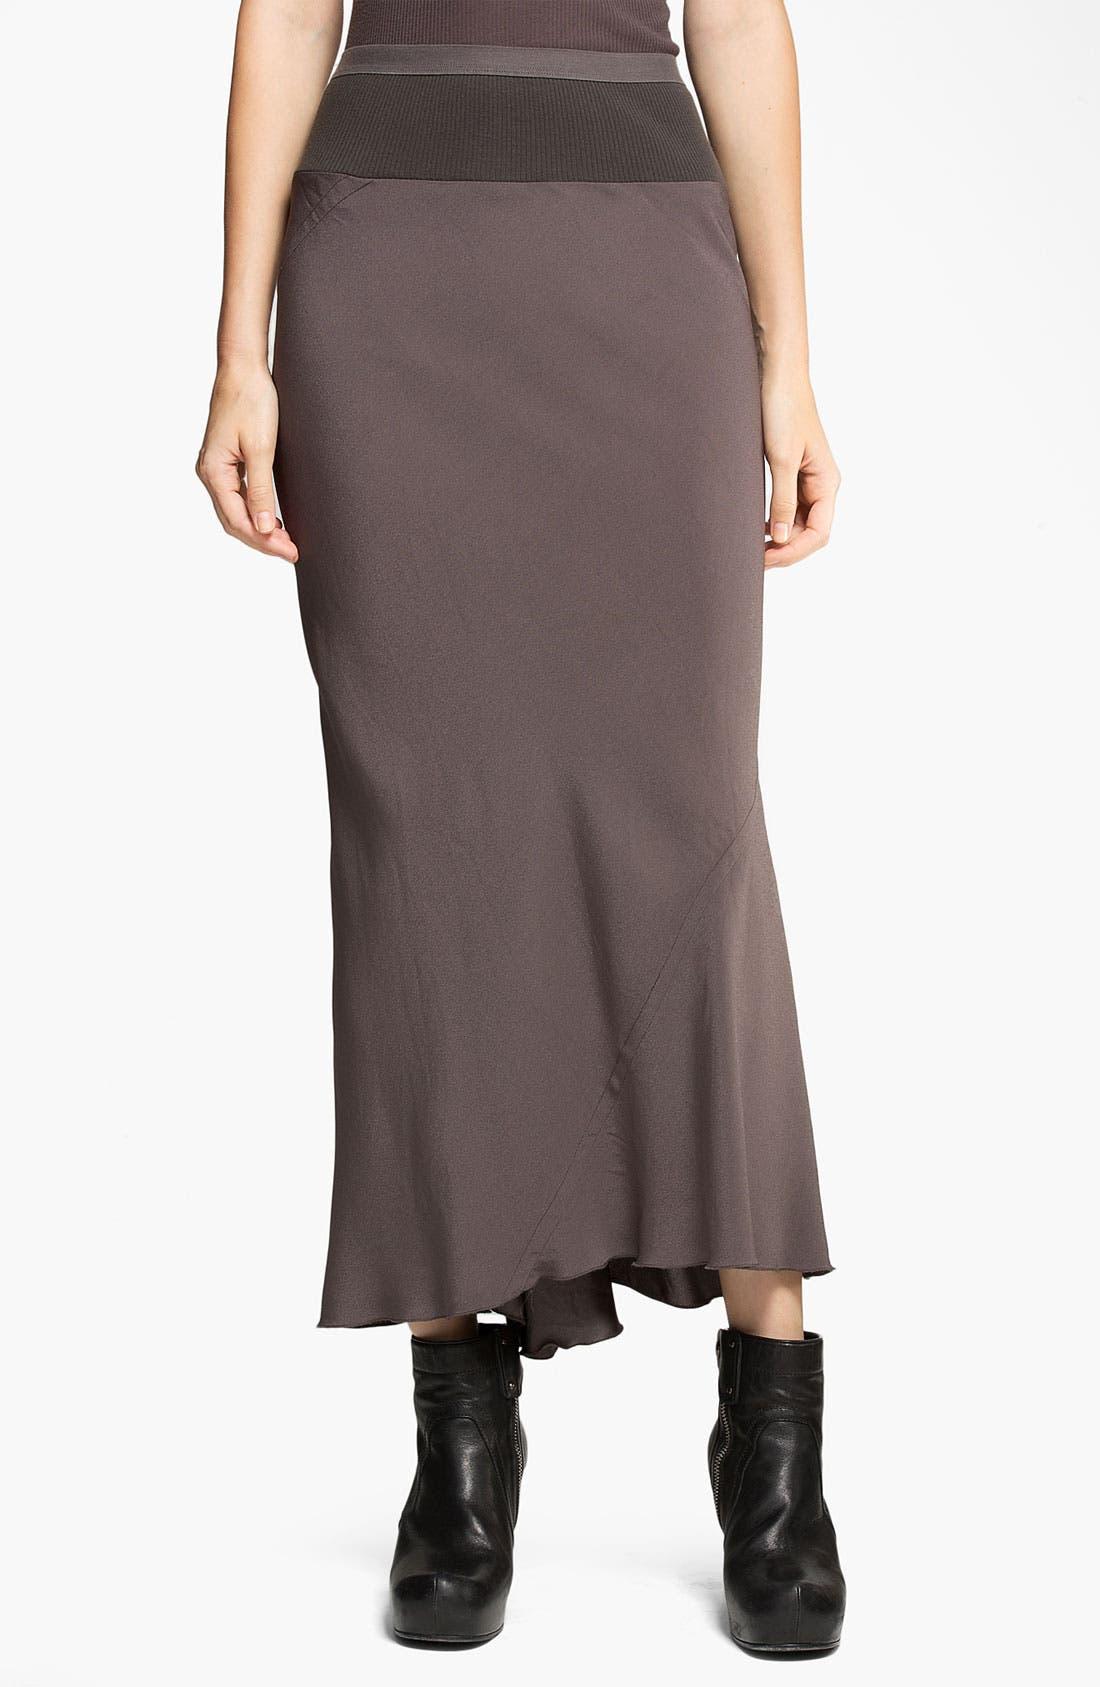 Alternate Image 1 Selected - Rick Owens Crepe Midi Skirt